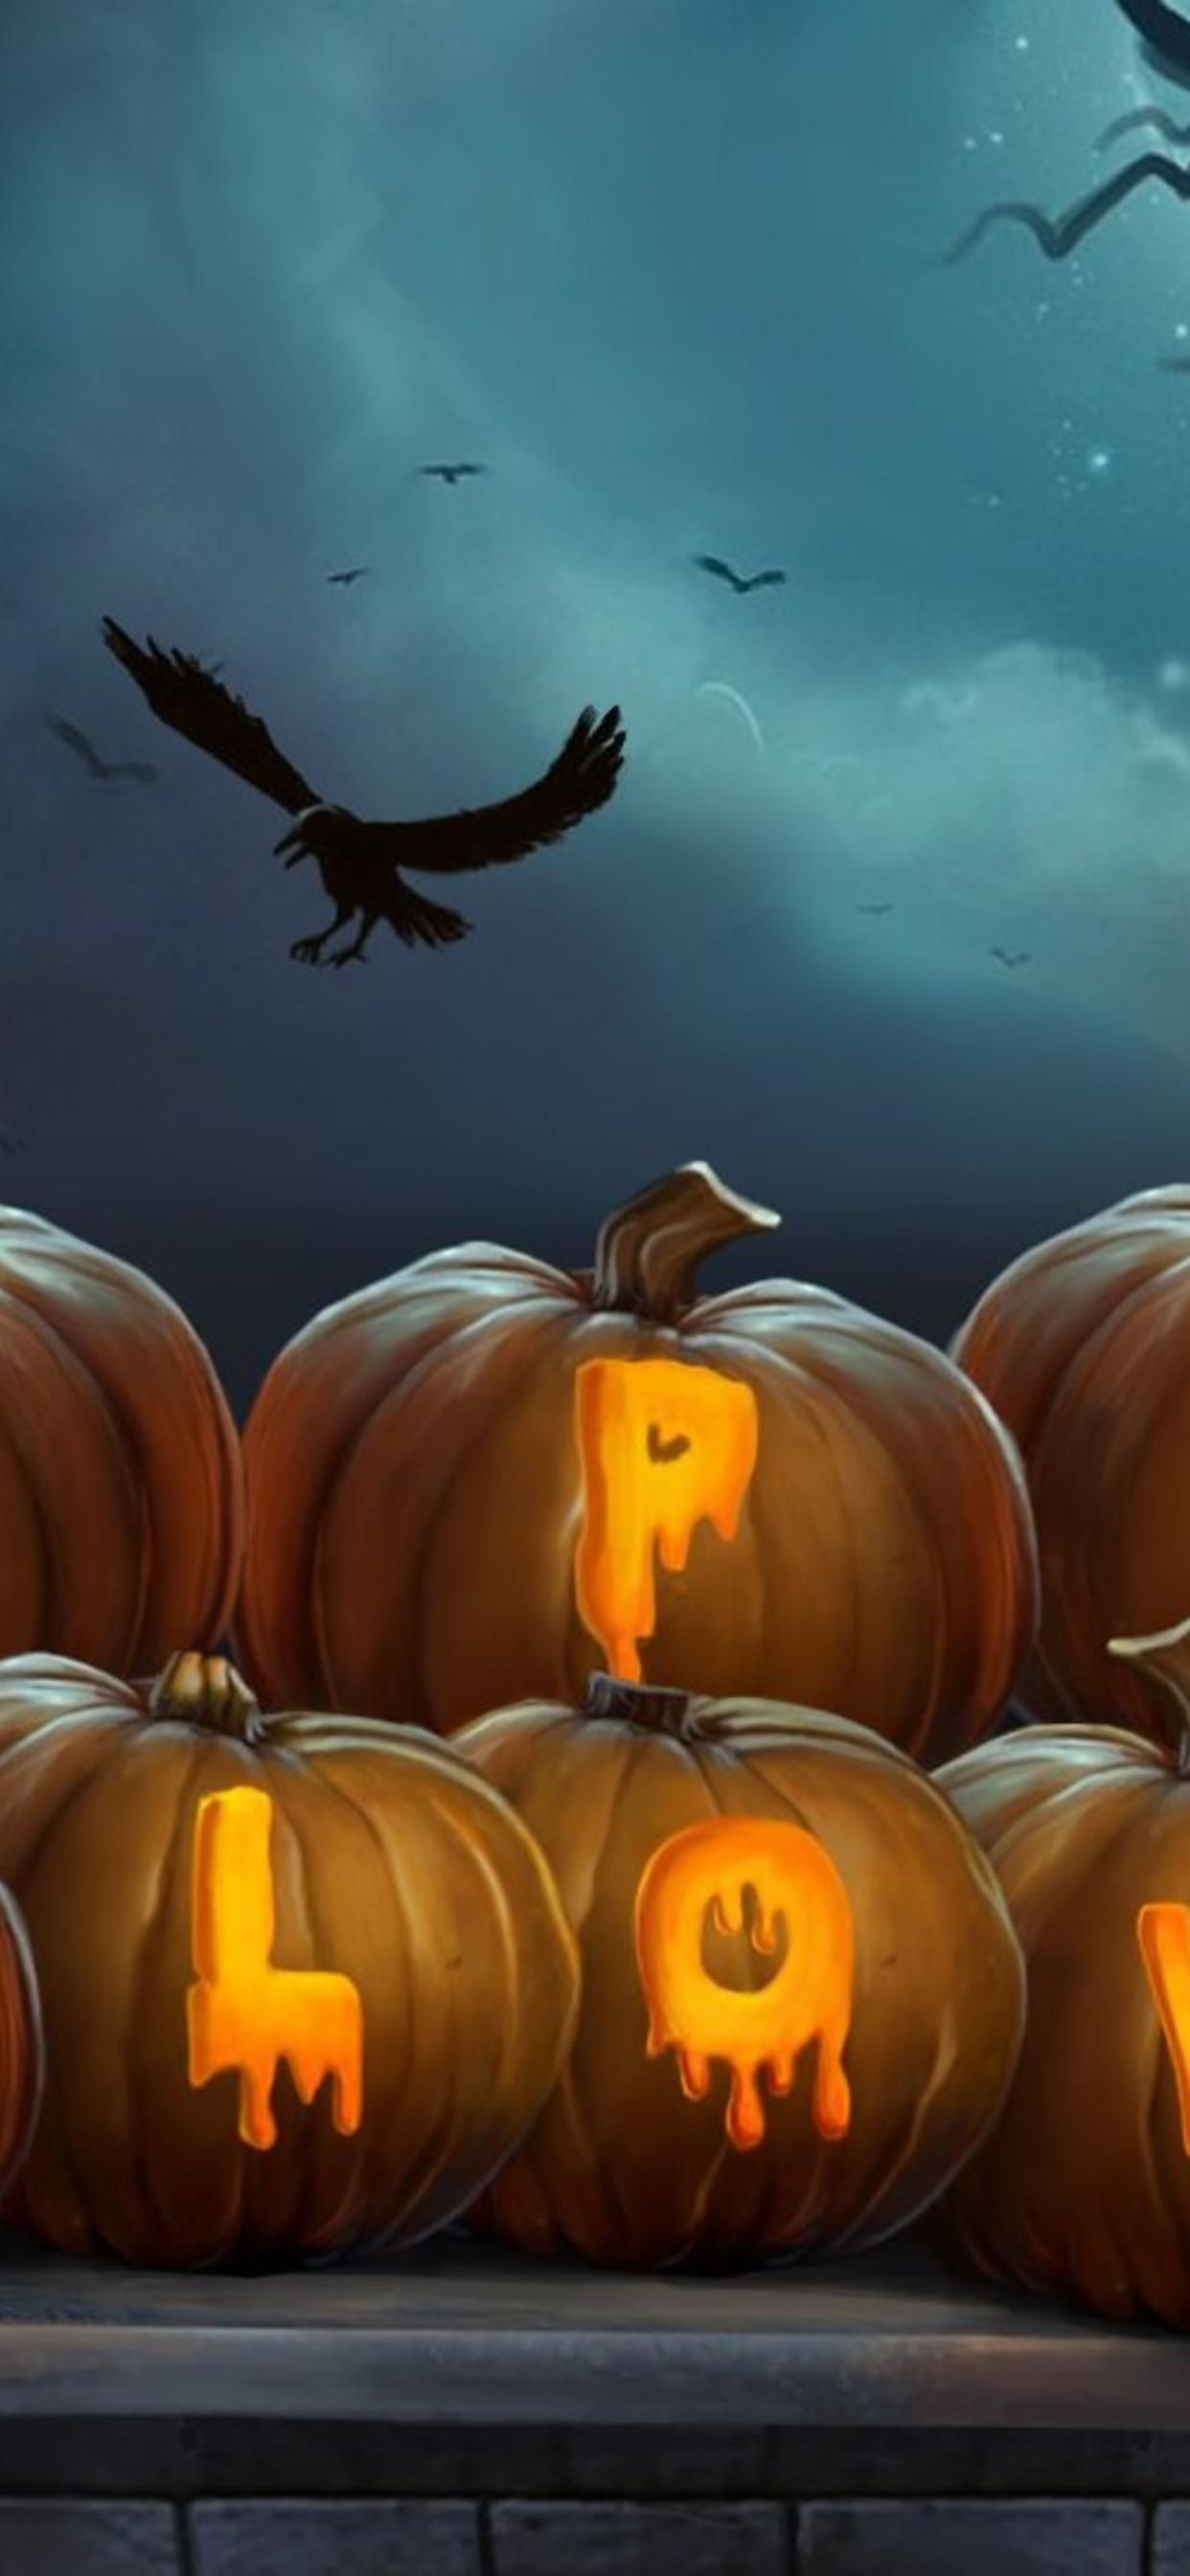 Happy Halloween Write On Pumpkins Hd Wallpaper